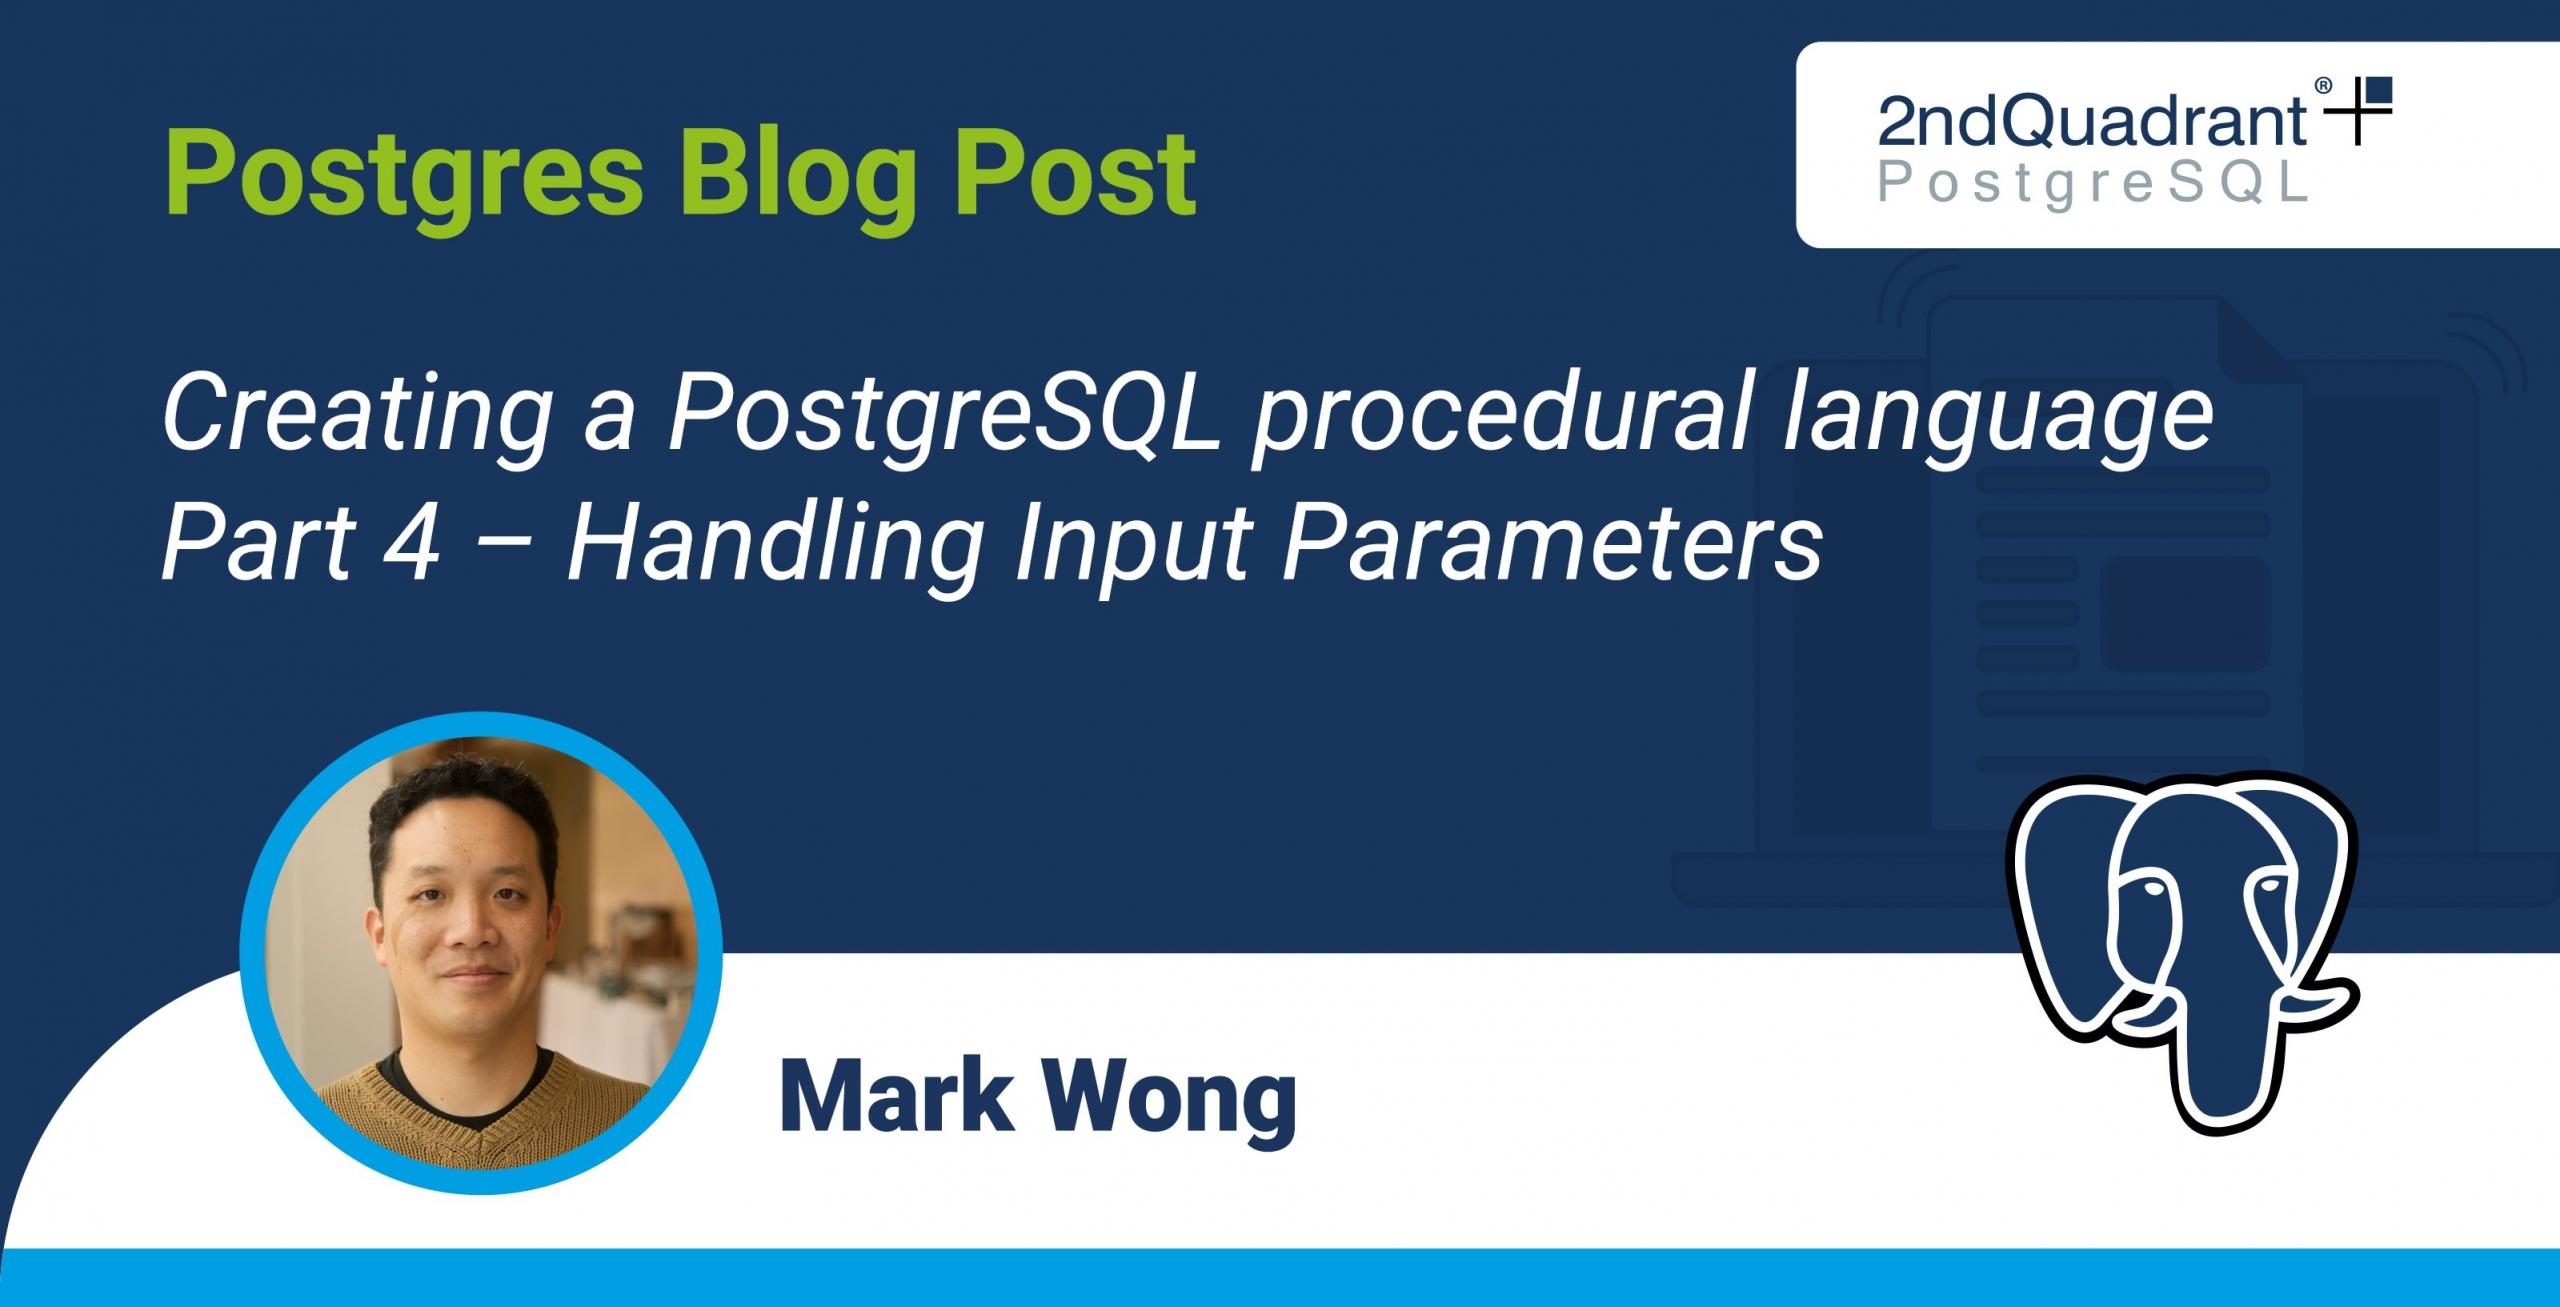 Creating a PostgreSQL procedural language - Part 4 - Handling Input Parameters